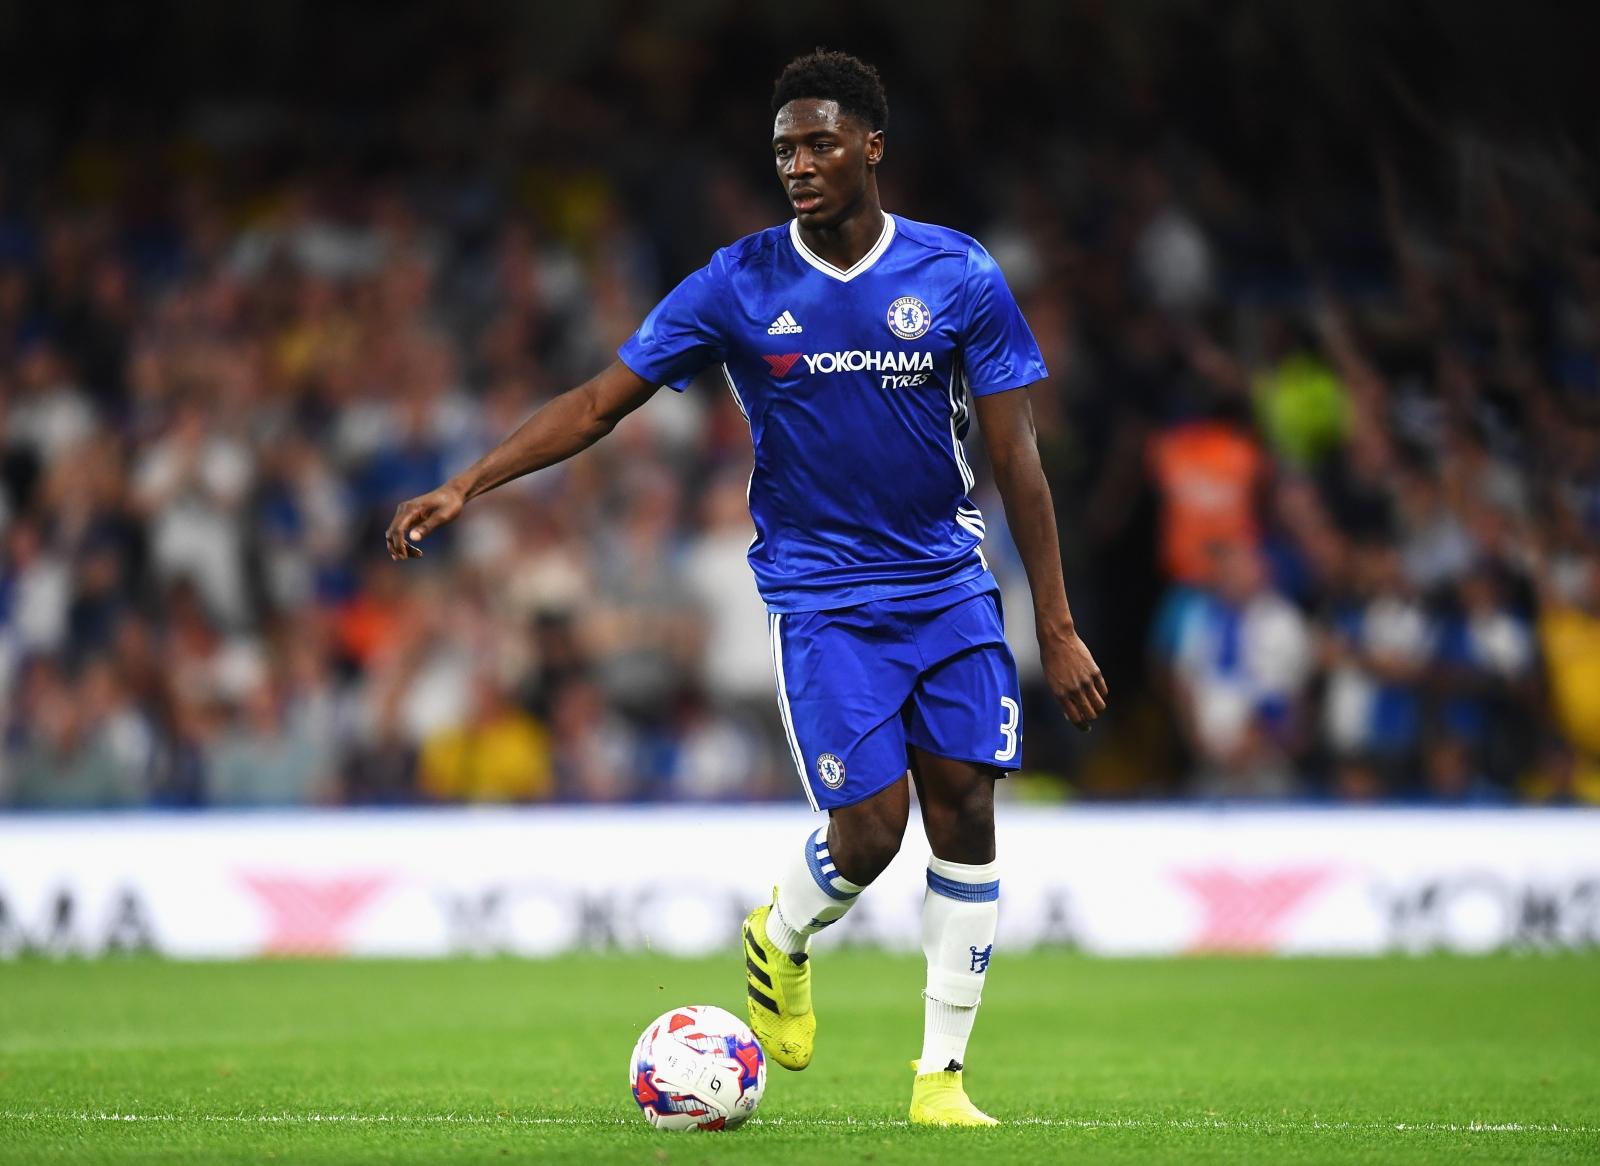 Chelsea defender joins Hull City on season-long loan